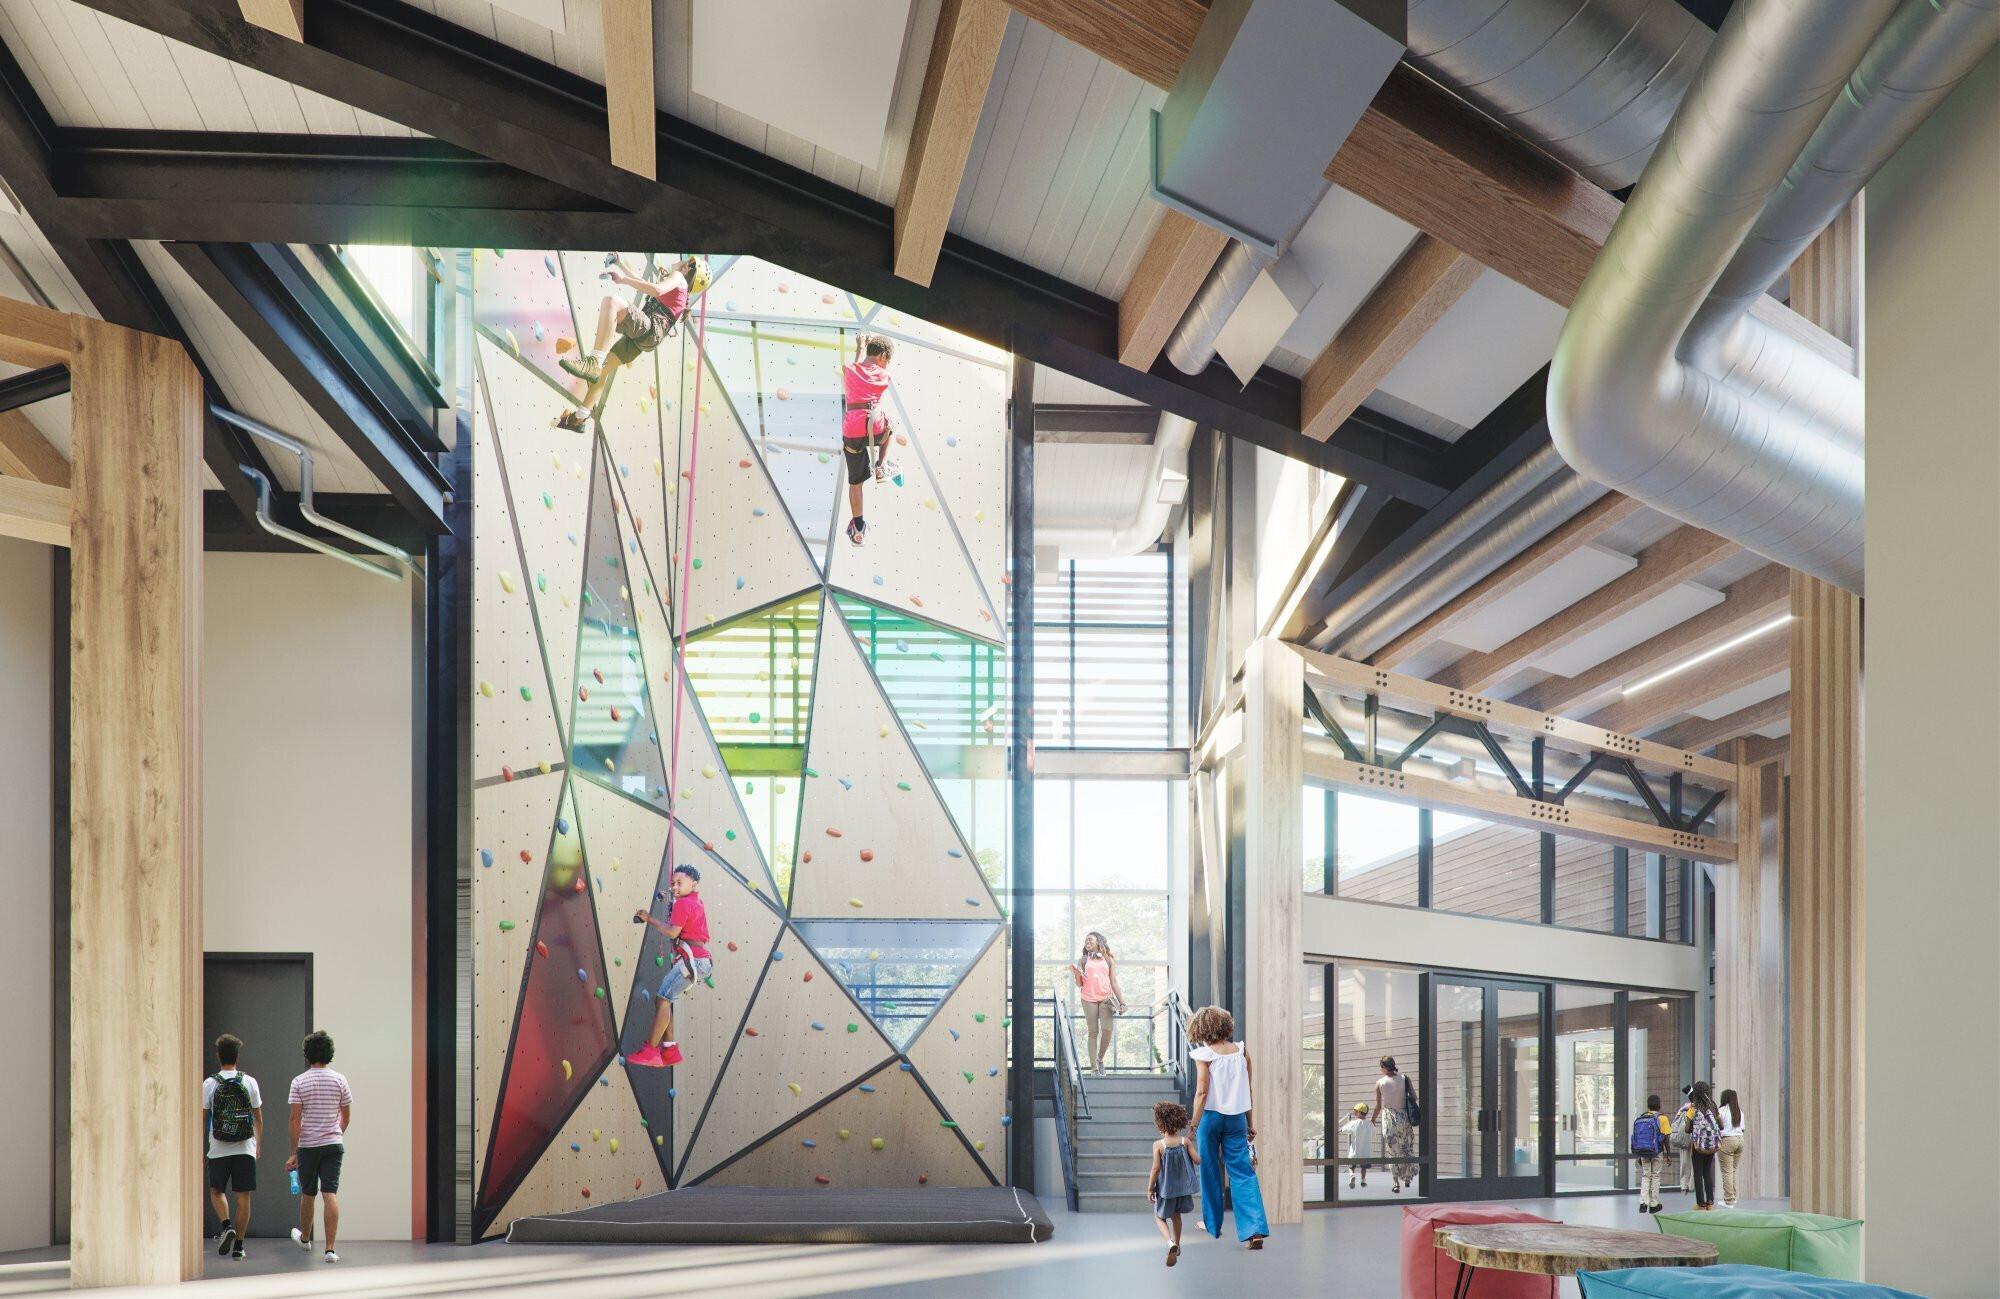 shawnee-outdoor-learning-center-interior-climbing-wall